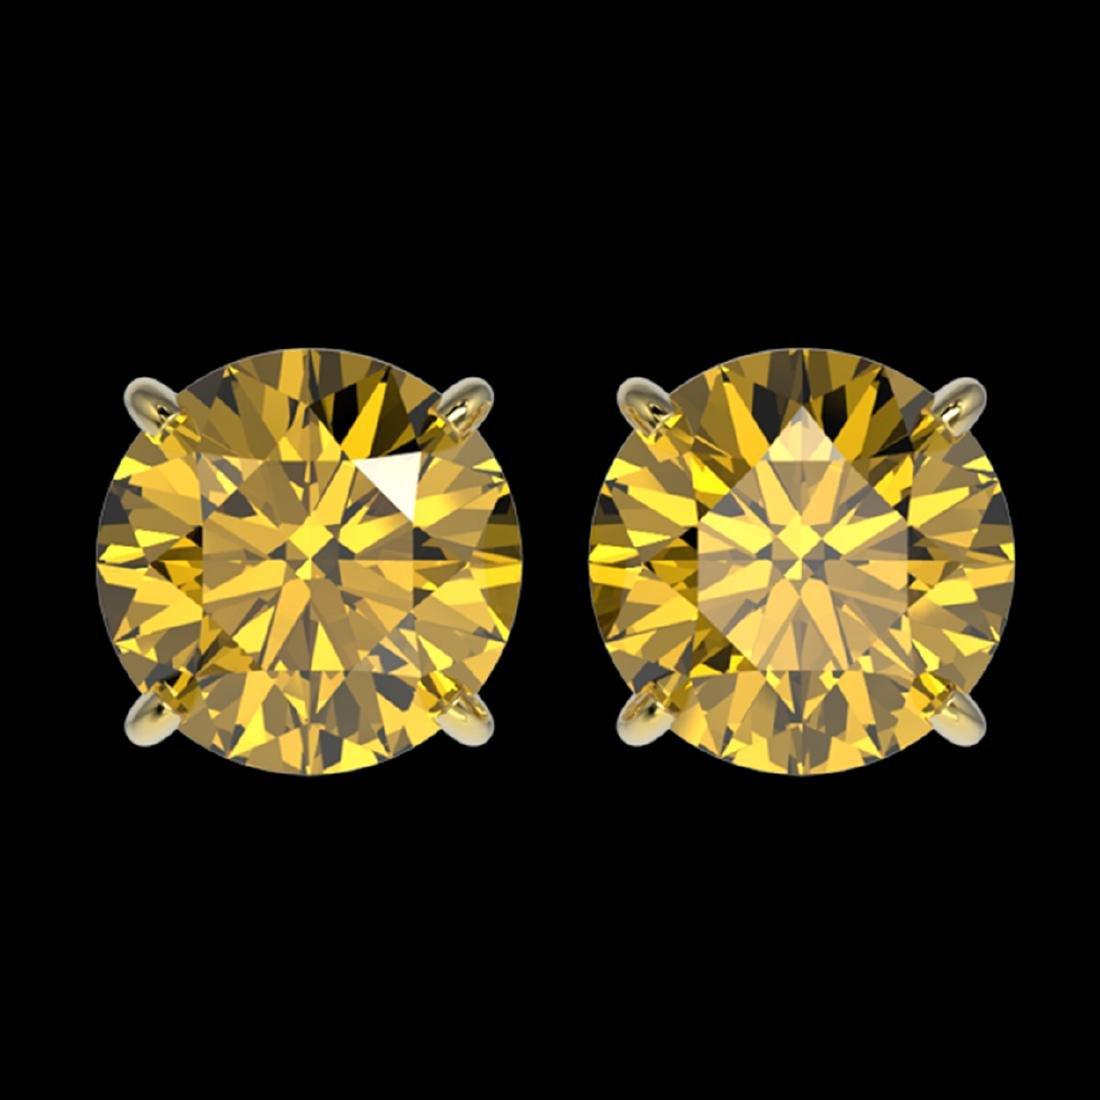 2.57 ctw Intense Yellow Diamond Stud Earrings 10K